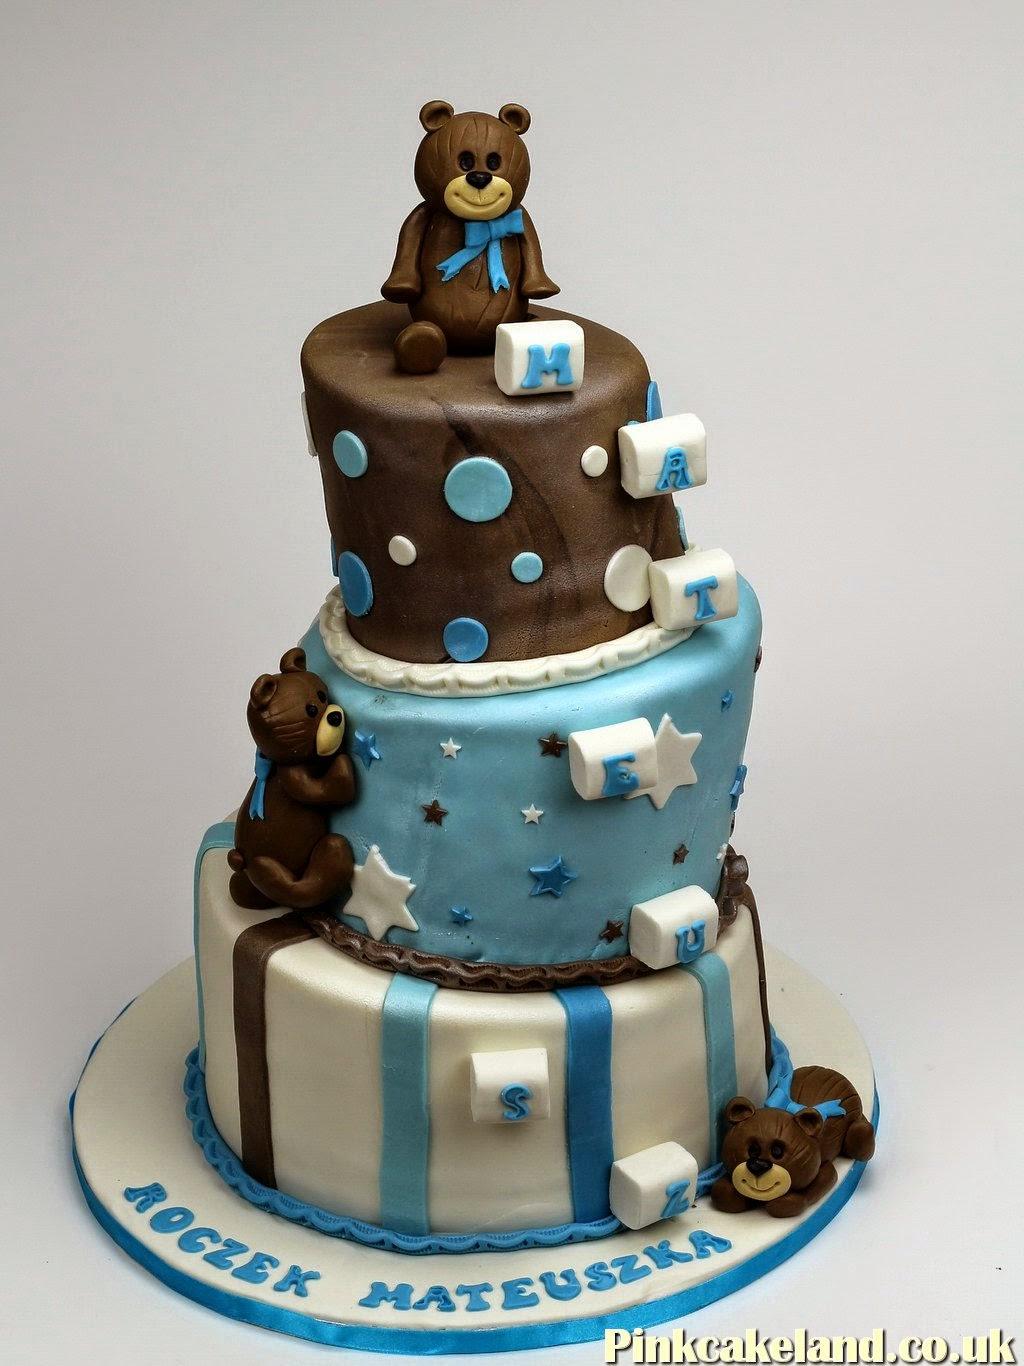 Teddies 1st Birthday Cake, Chelsea